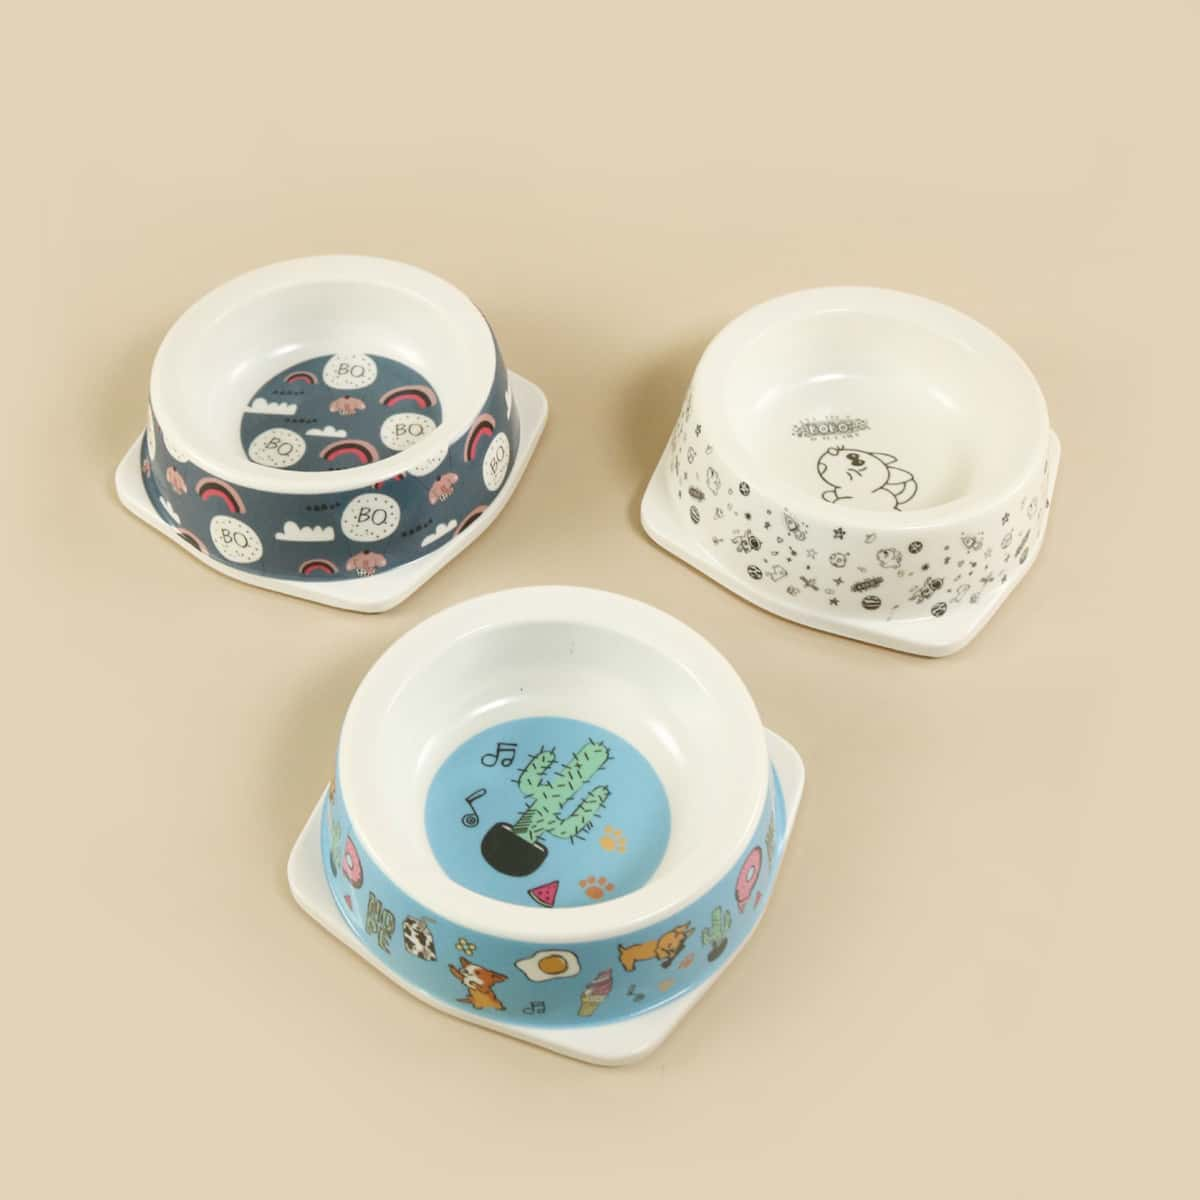 1pc Random Cartoon Pet Bowl, SHEIN  - buy with discount